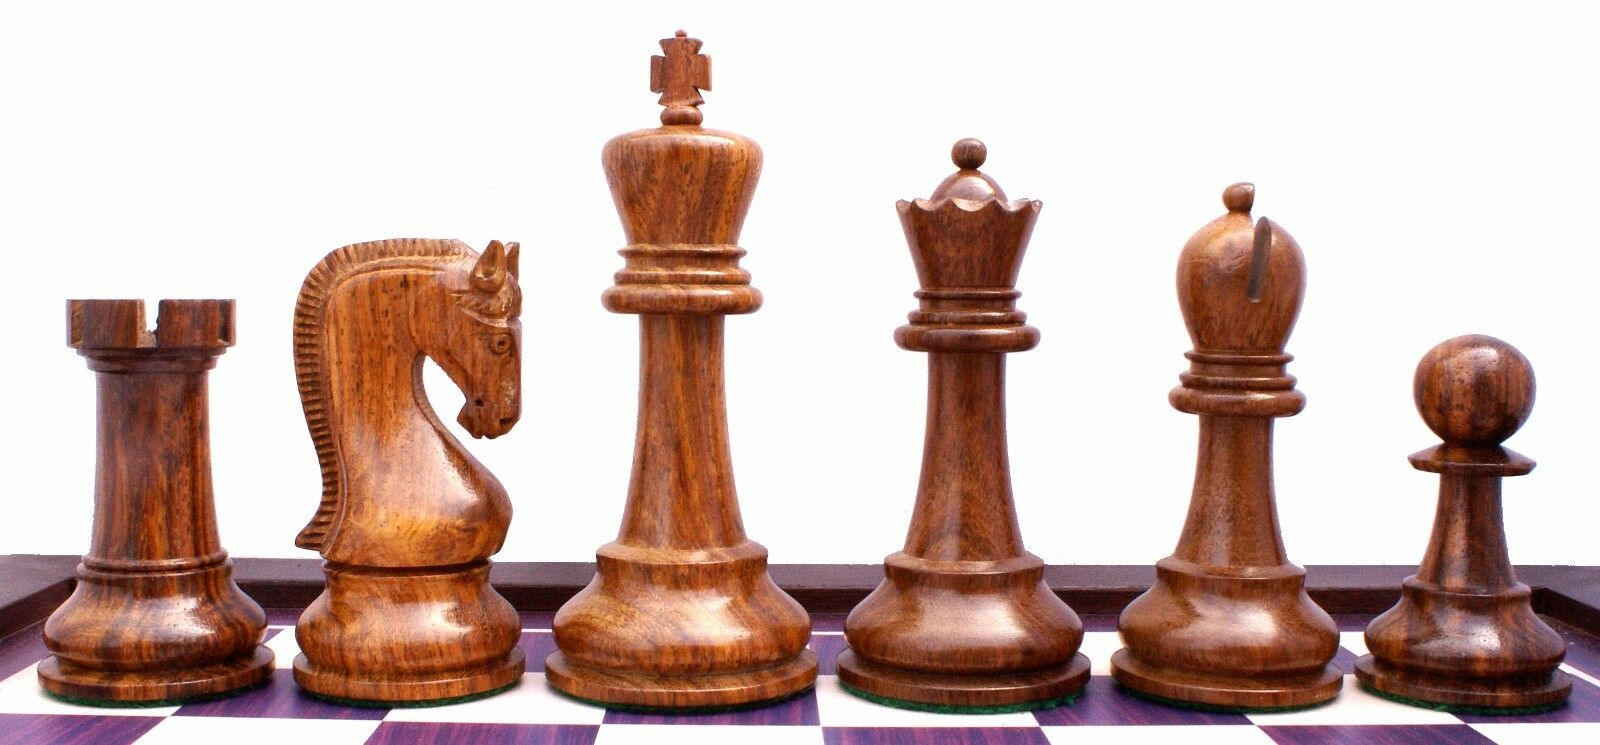 Leningrade Series Premium Staunton 4  Chess Set in Shesham Wood & Box Wood